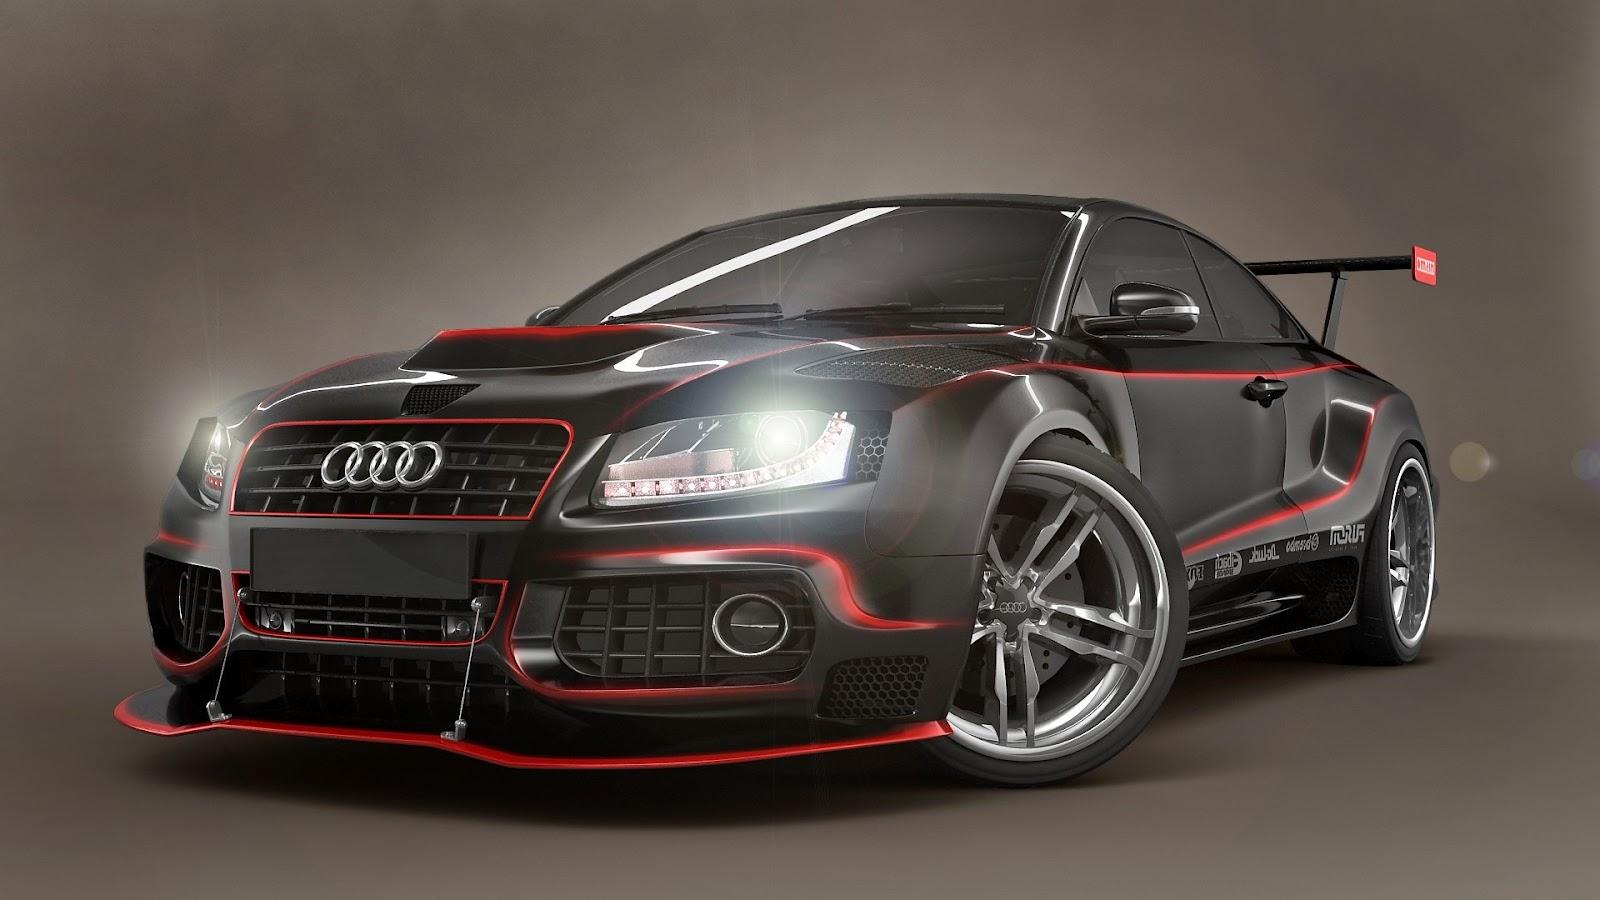 http://1.bp.blogspot.com/-eXA6AEJugLw/T1IuMYwrf6I/AAAAAAAAAx4/h4Jxrh_KOKo/s1600/Audi_S5_Body_Kit_Modifies_Red_Lines_HD_Car_Wallpaper.jpg